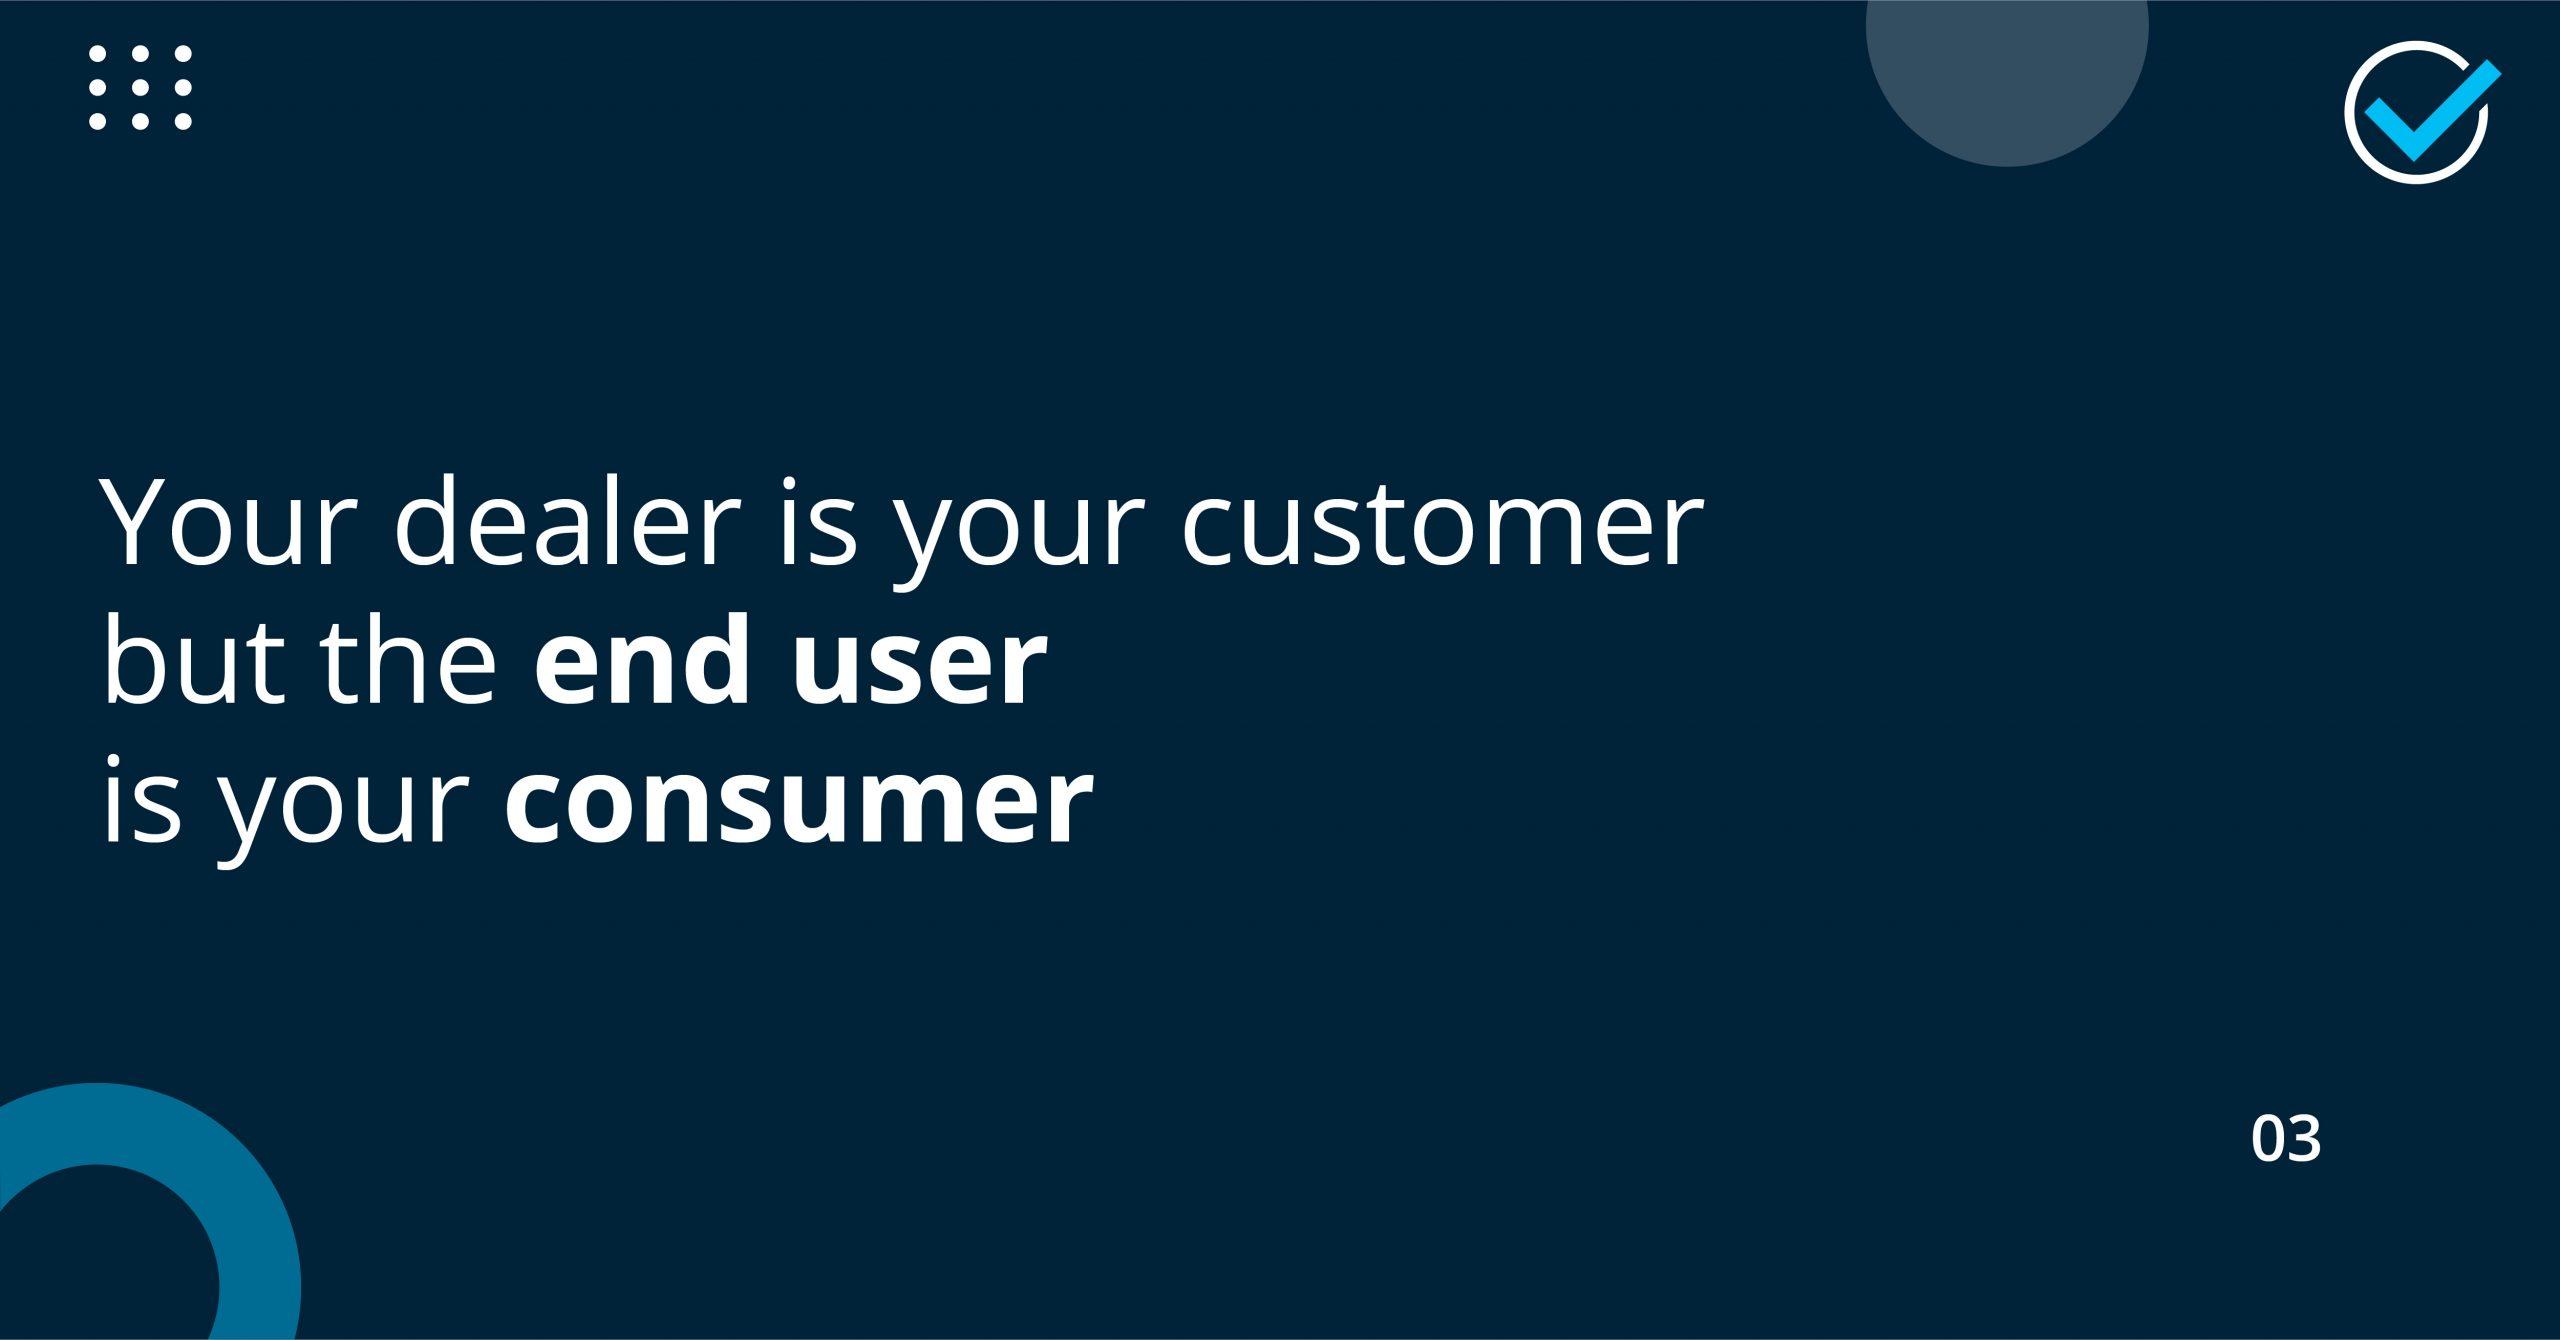 understanding end user, consumer